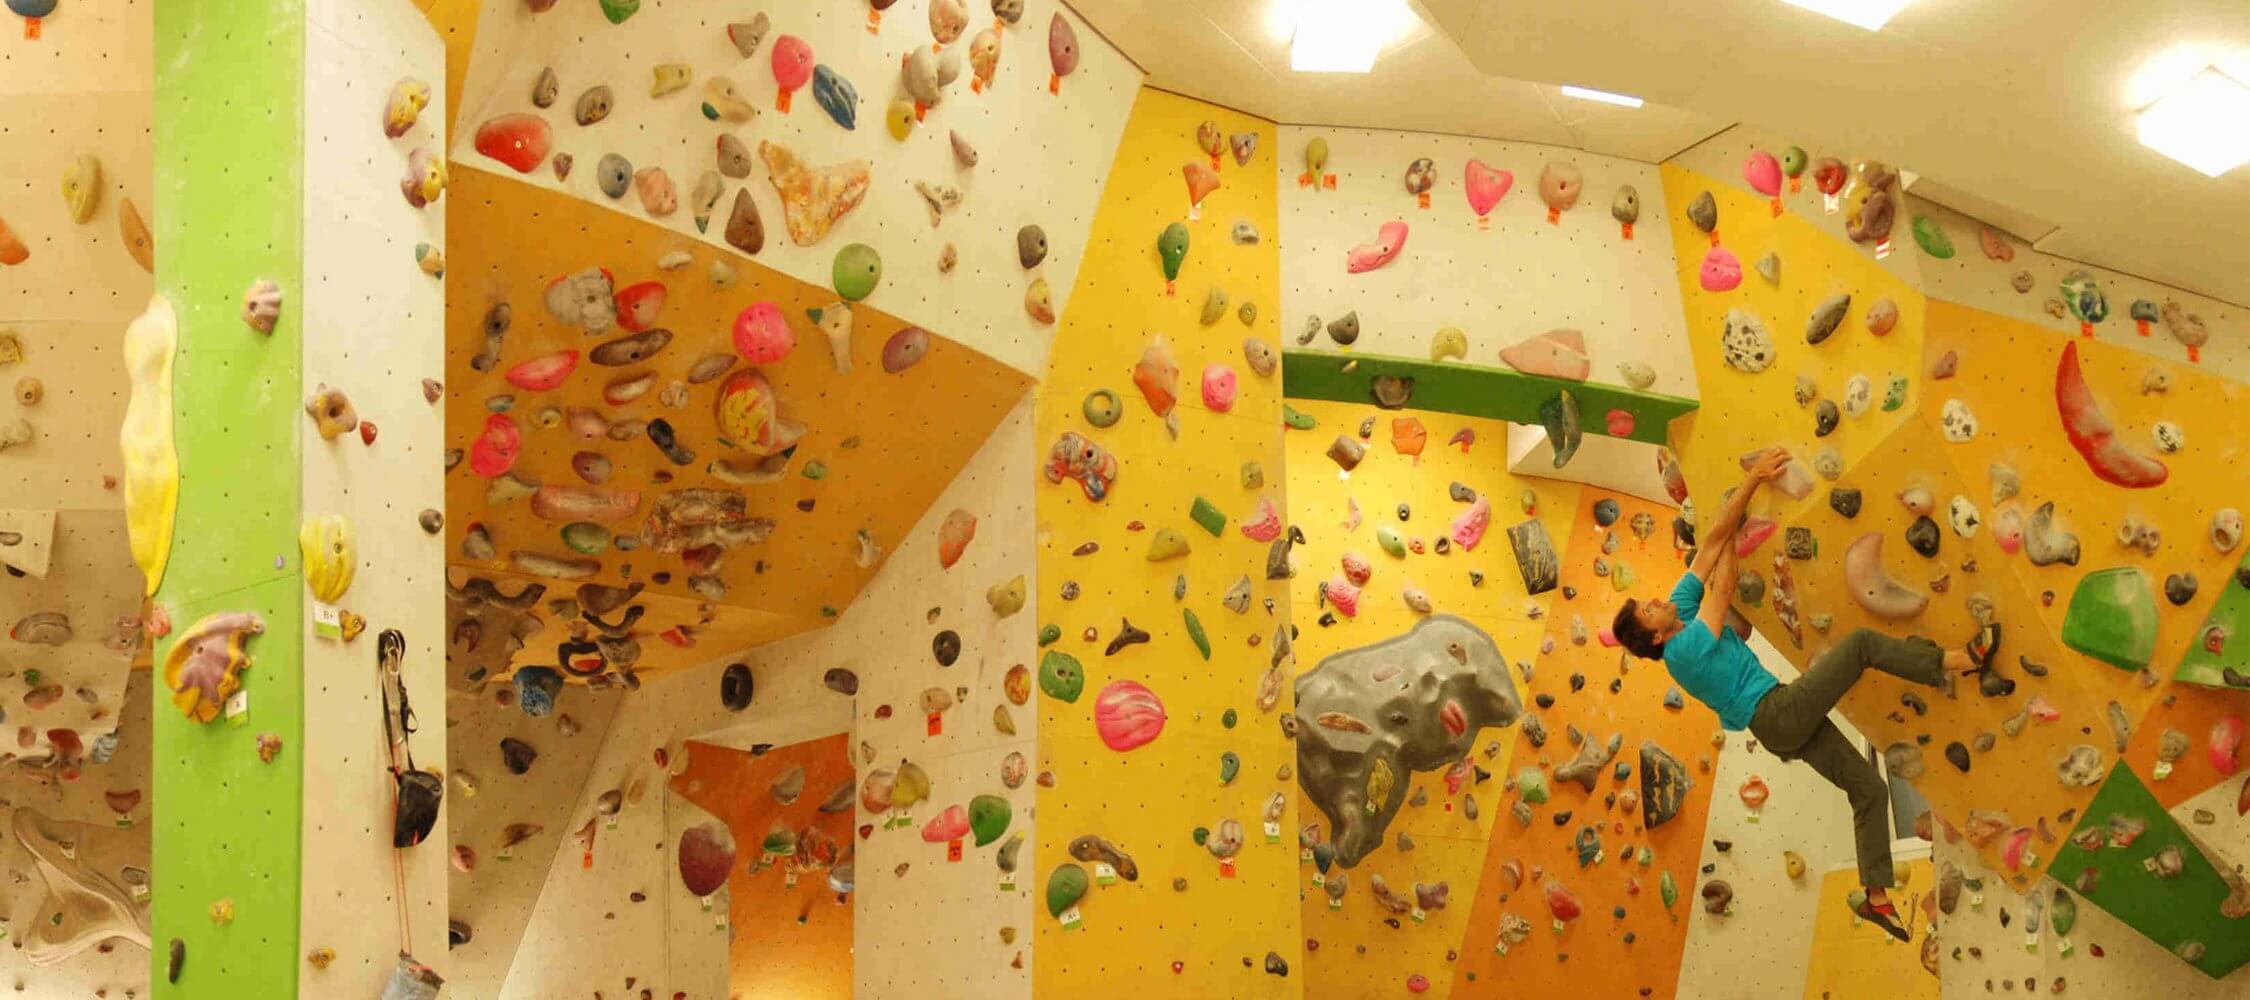 Italien-Trentino_Suedtirol_Alto_Adige_Merano_Meran_Natur_Sport_Sommer_Klettern_Kletterhalle_Rockarena_AVS-Meran_2250x1000